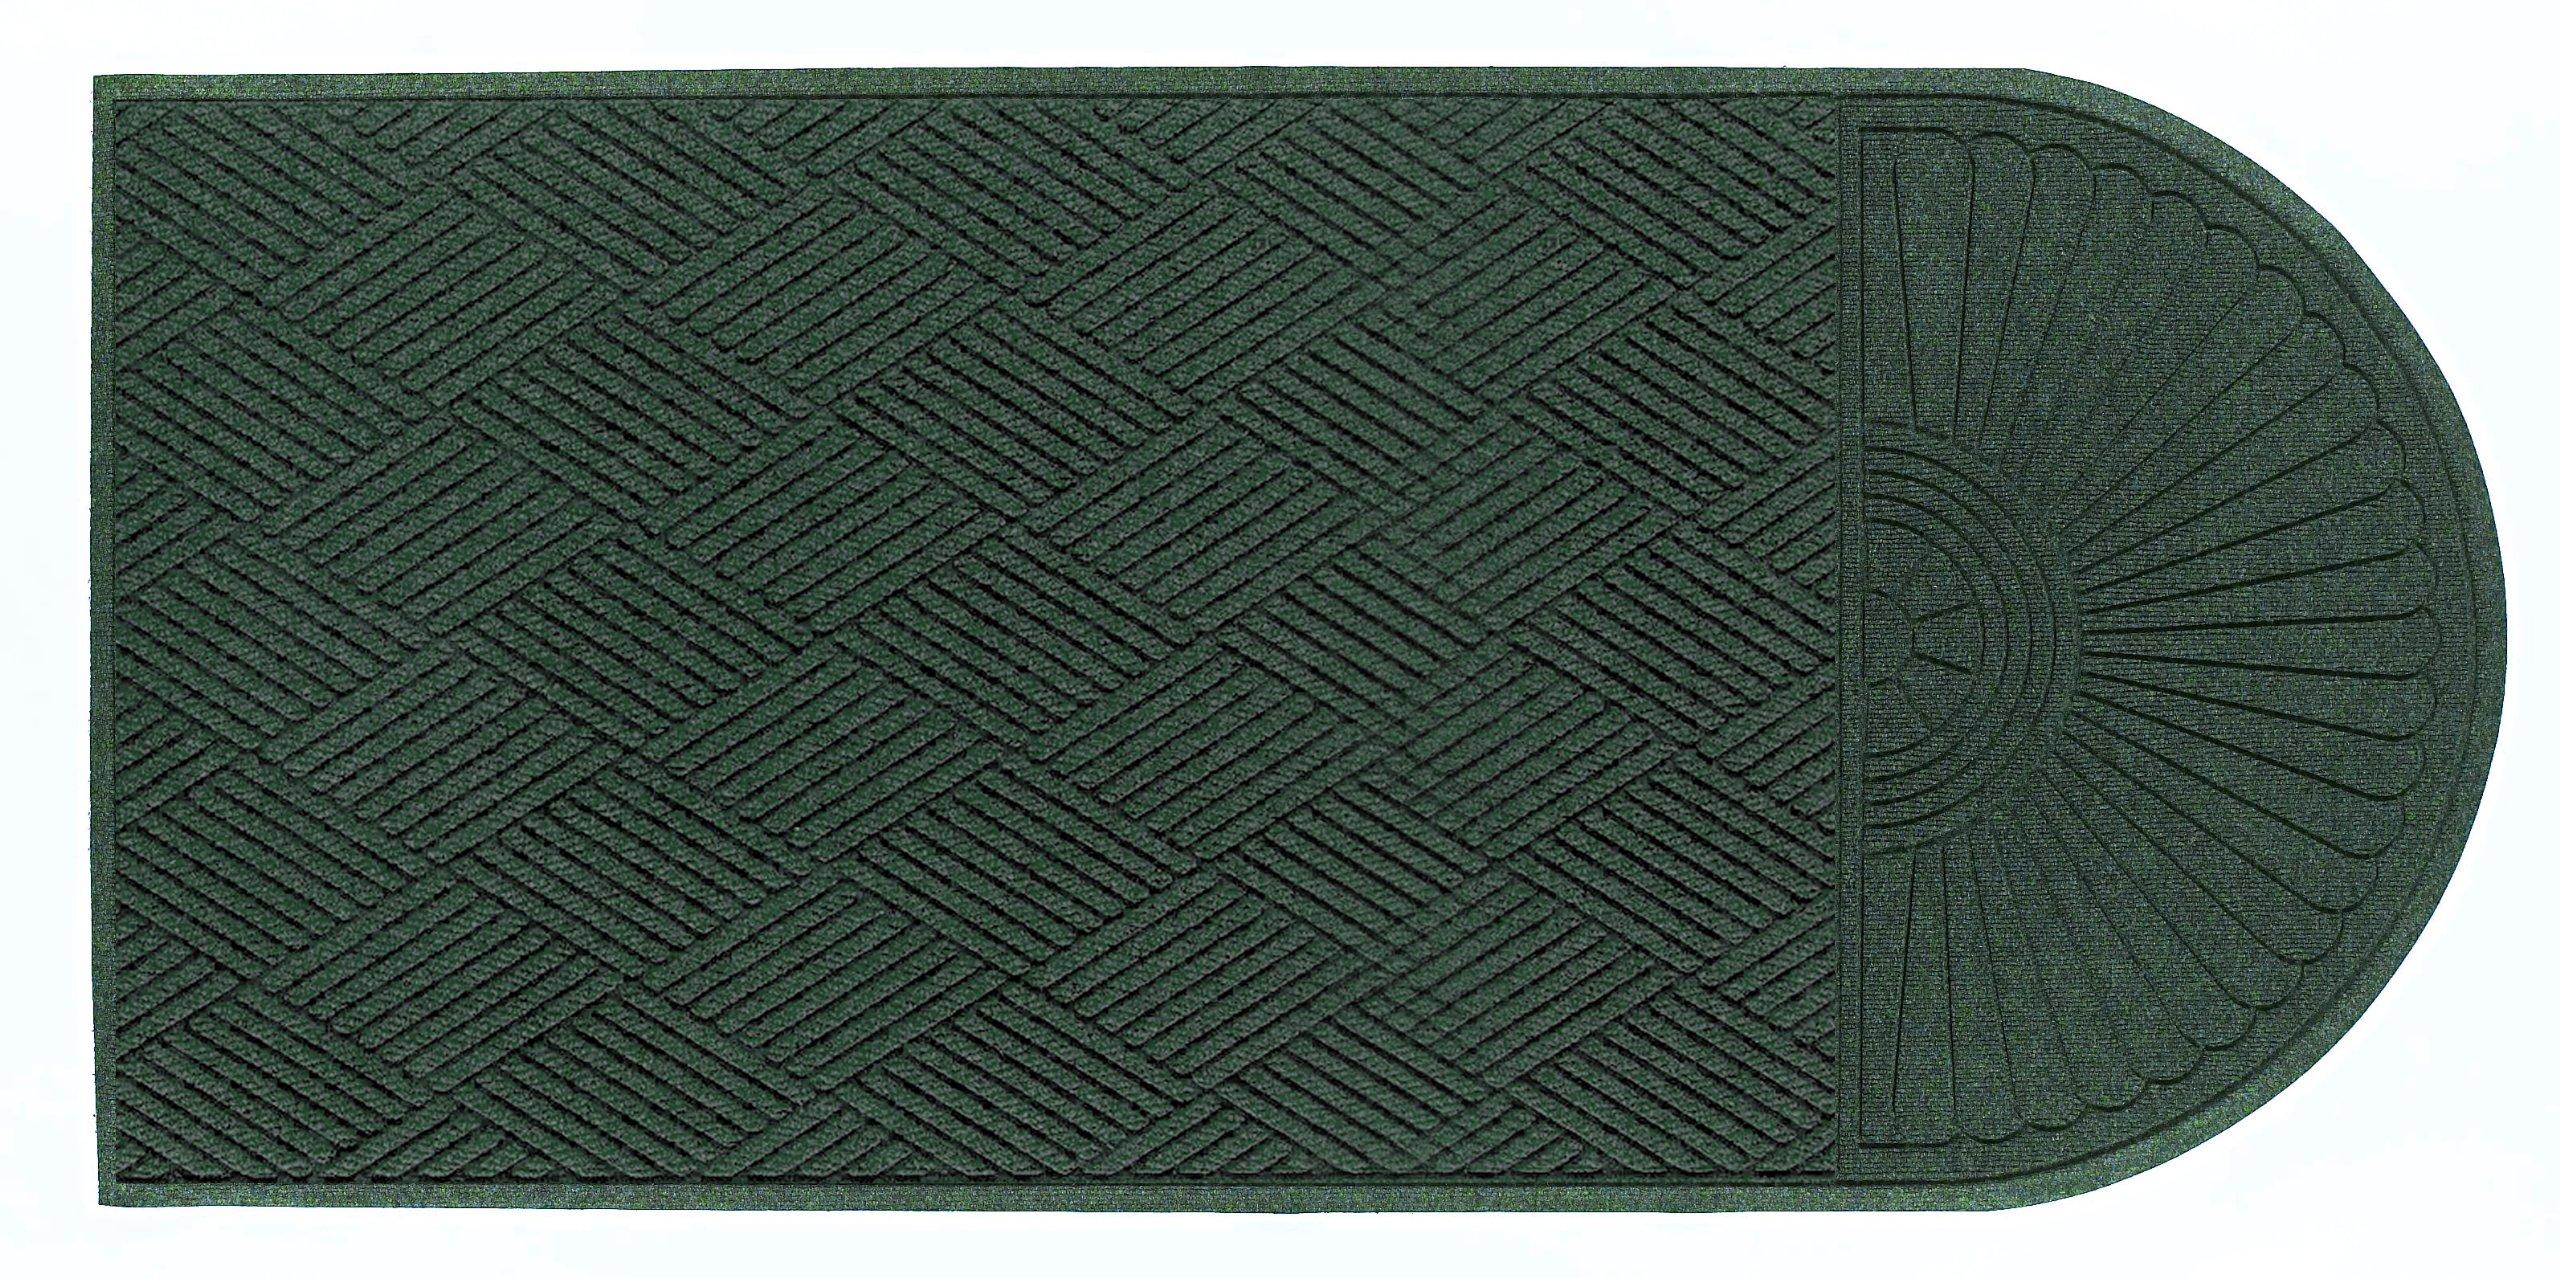 M+A Matting 22248 Waterhog Eco Grand Premier PET Polyester Fiber Single End Entrance Indoor/Outdoor Floor Mat, SBR Rubber Backing, 11.6' Length x 6' Width, 3/8'' Thick, Southern Pine